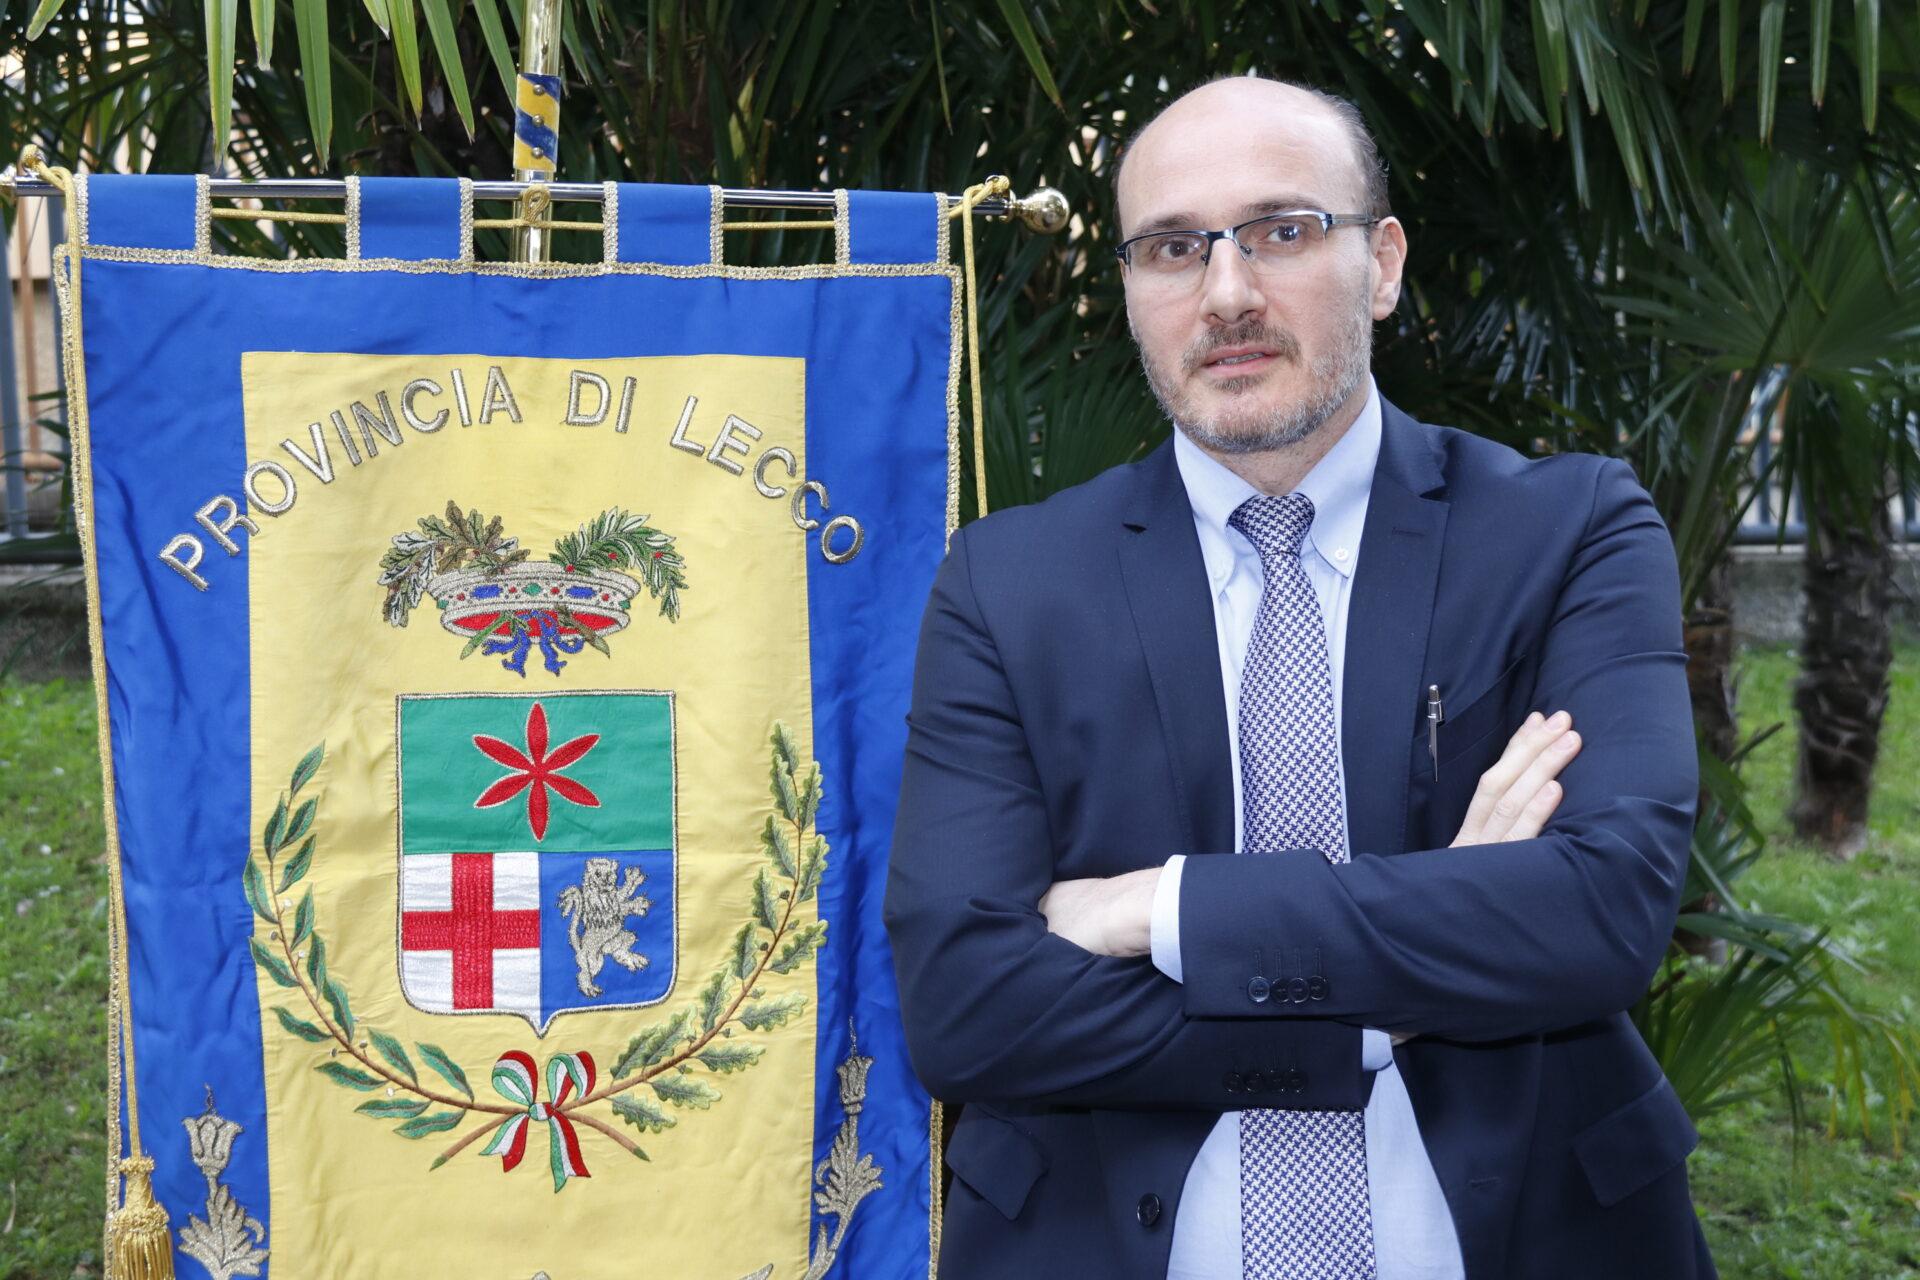 Mario Blandino